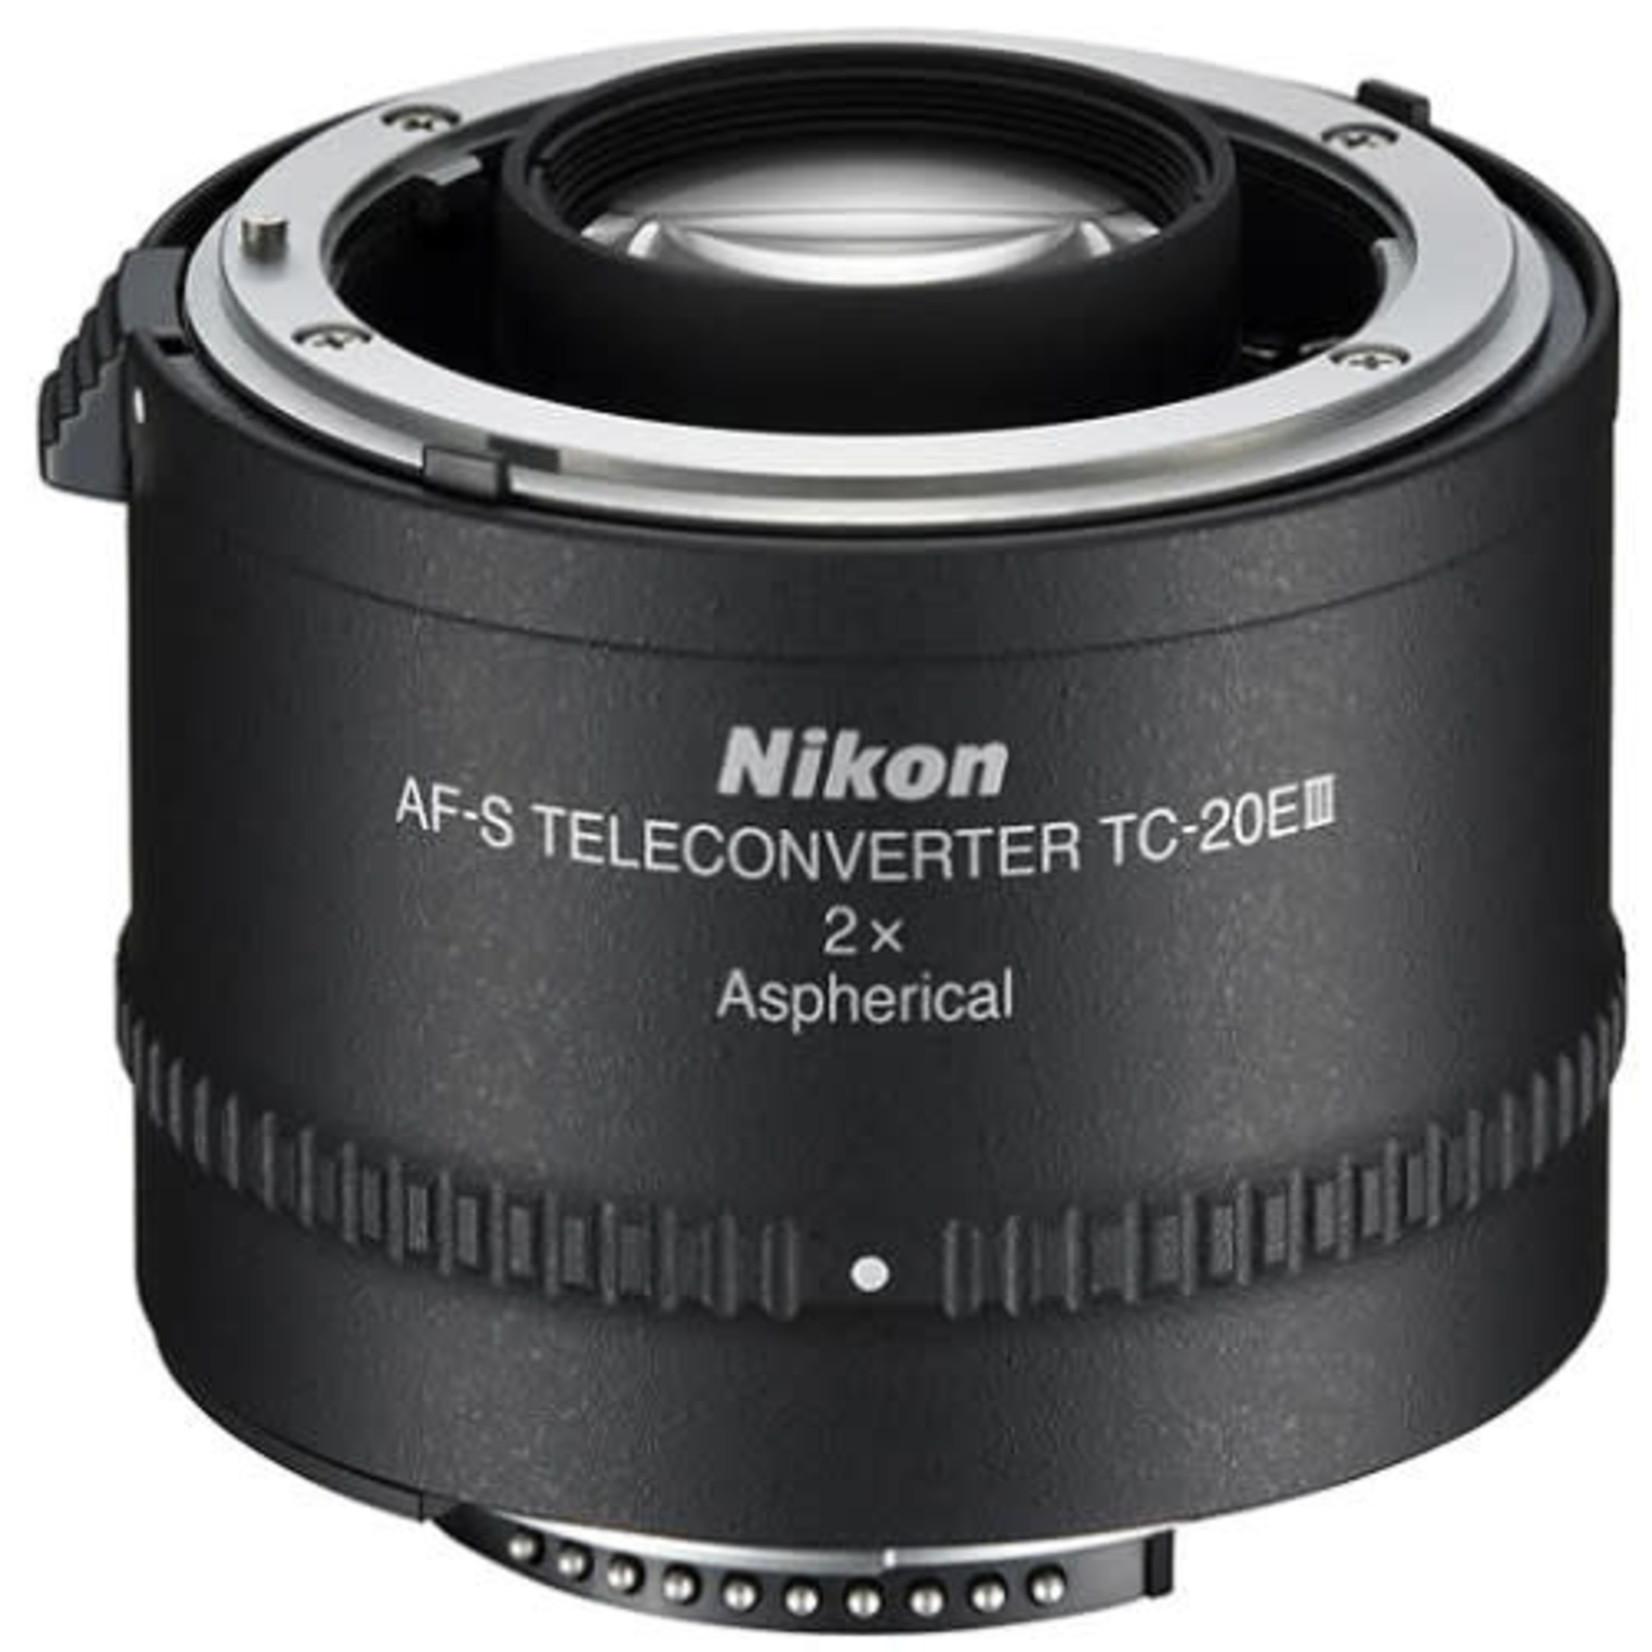 Nikon Nikon AF-S Teleconverter TC-20E III